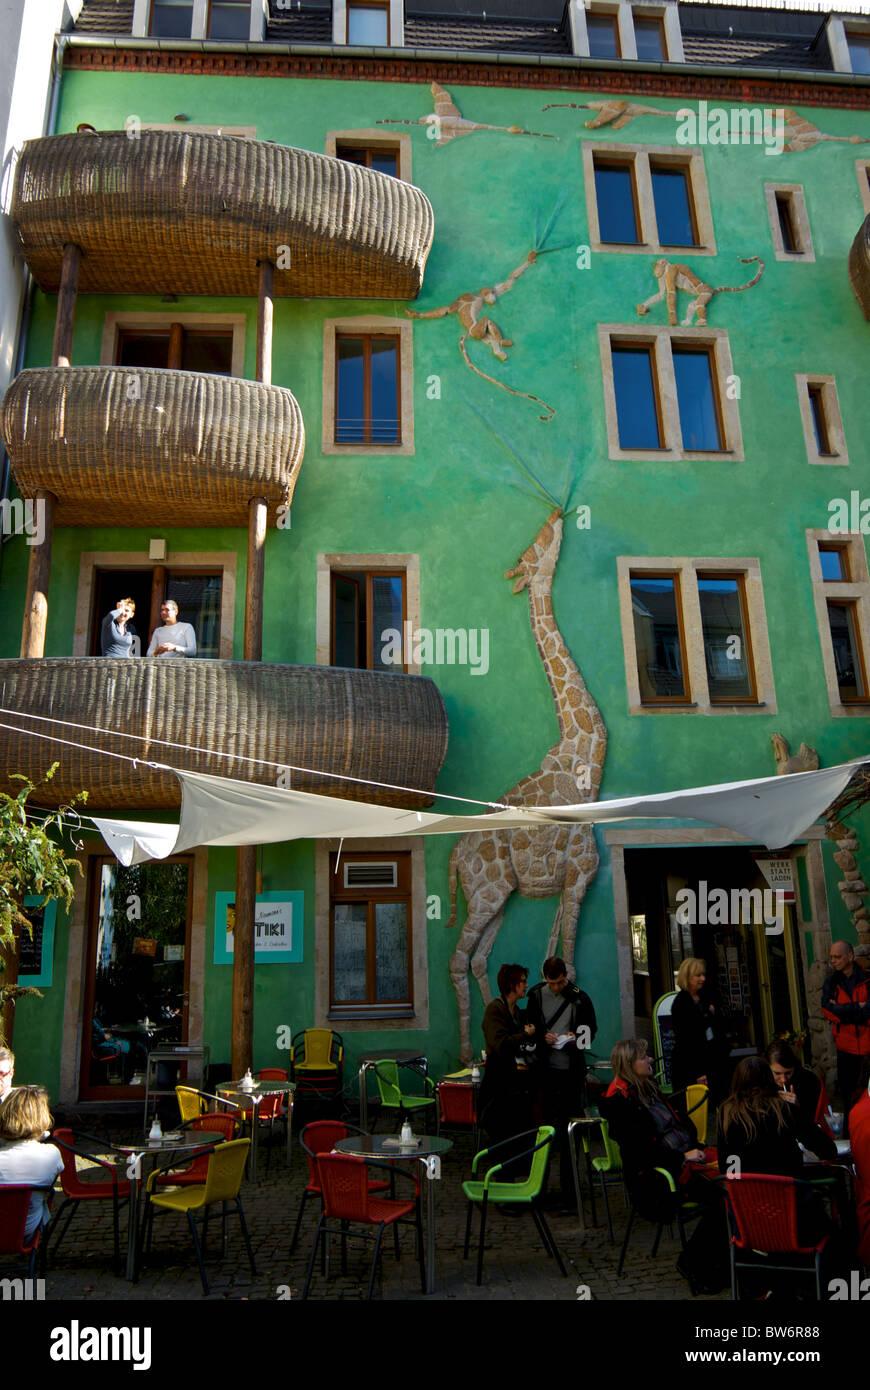 Wicker basket enclosed balconies pottery giraffe monkeys ibises Courtyard of Metamorphoses Dresden new town neustadt - Stock Image